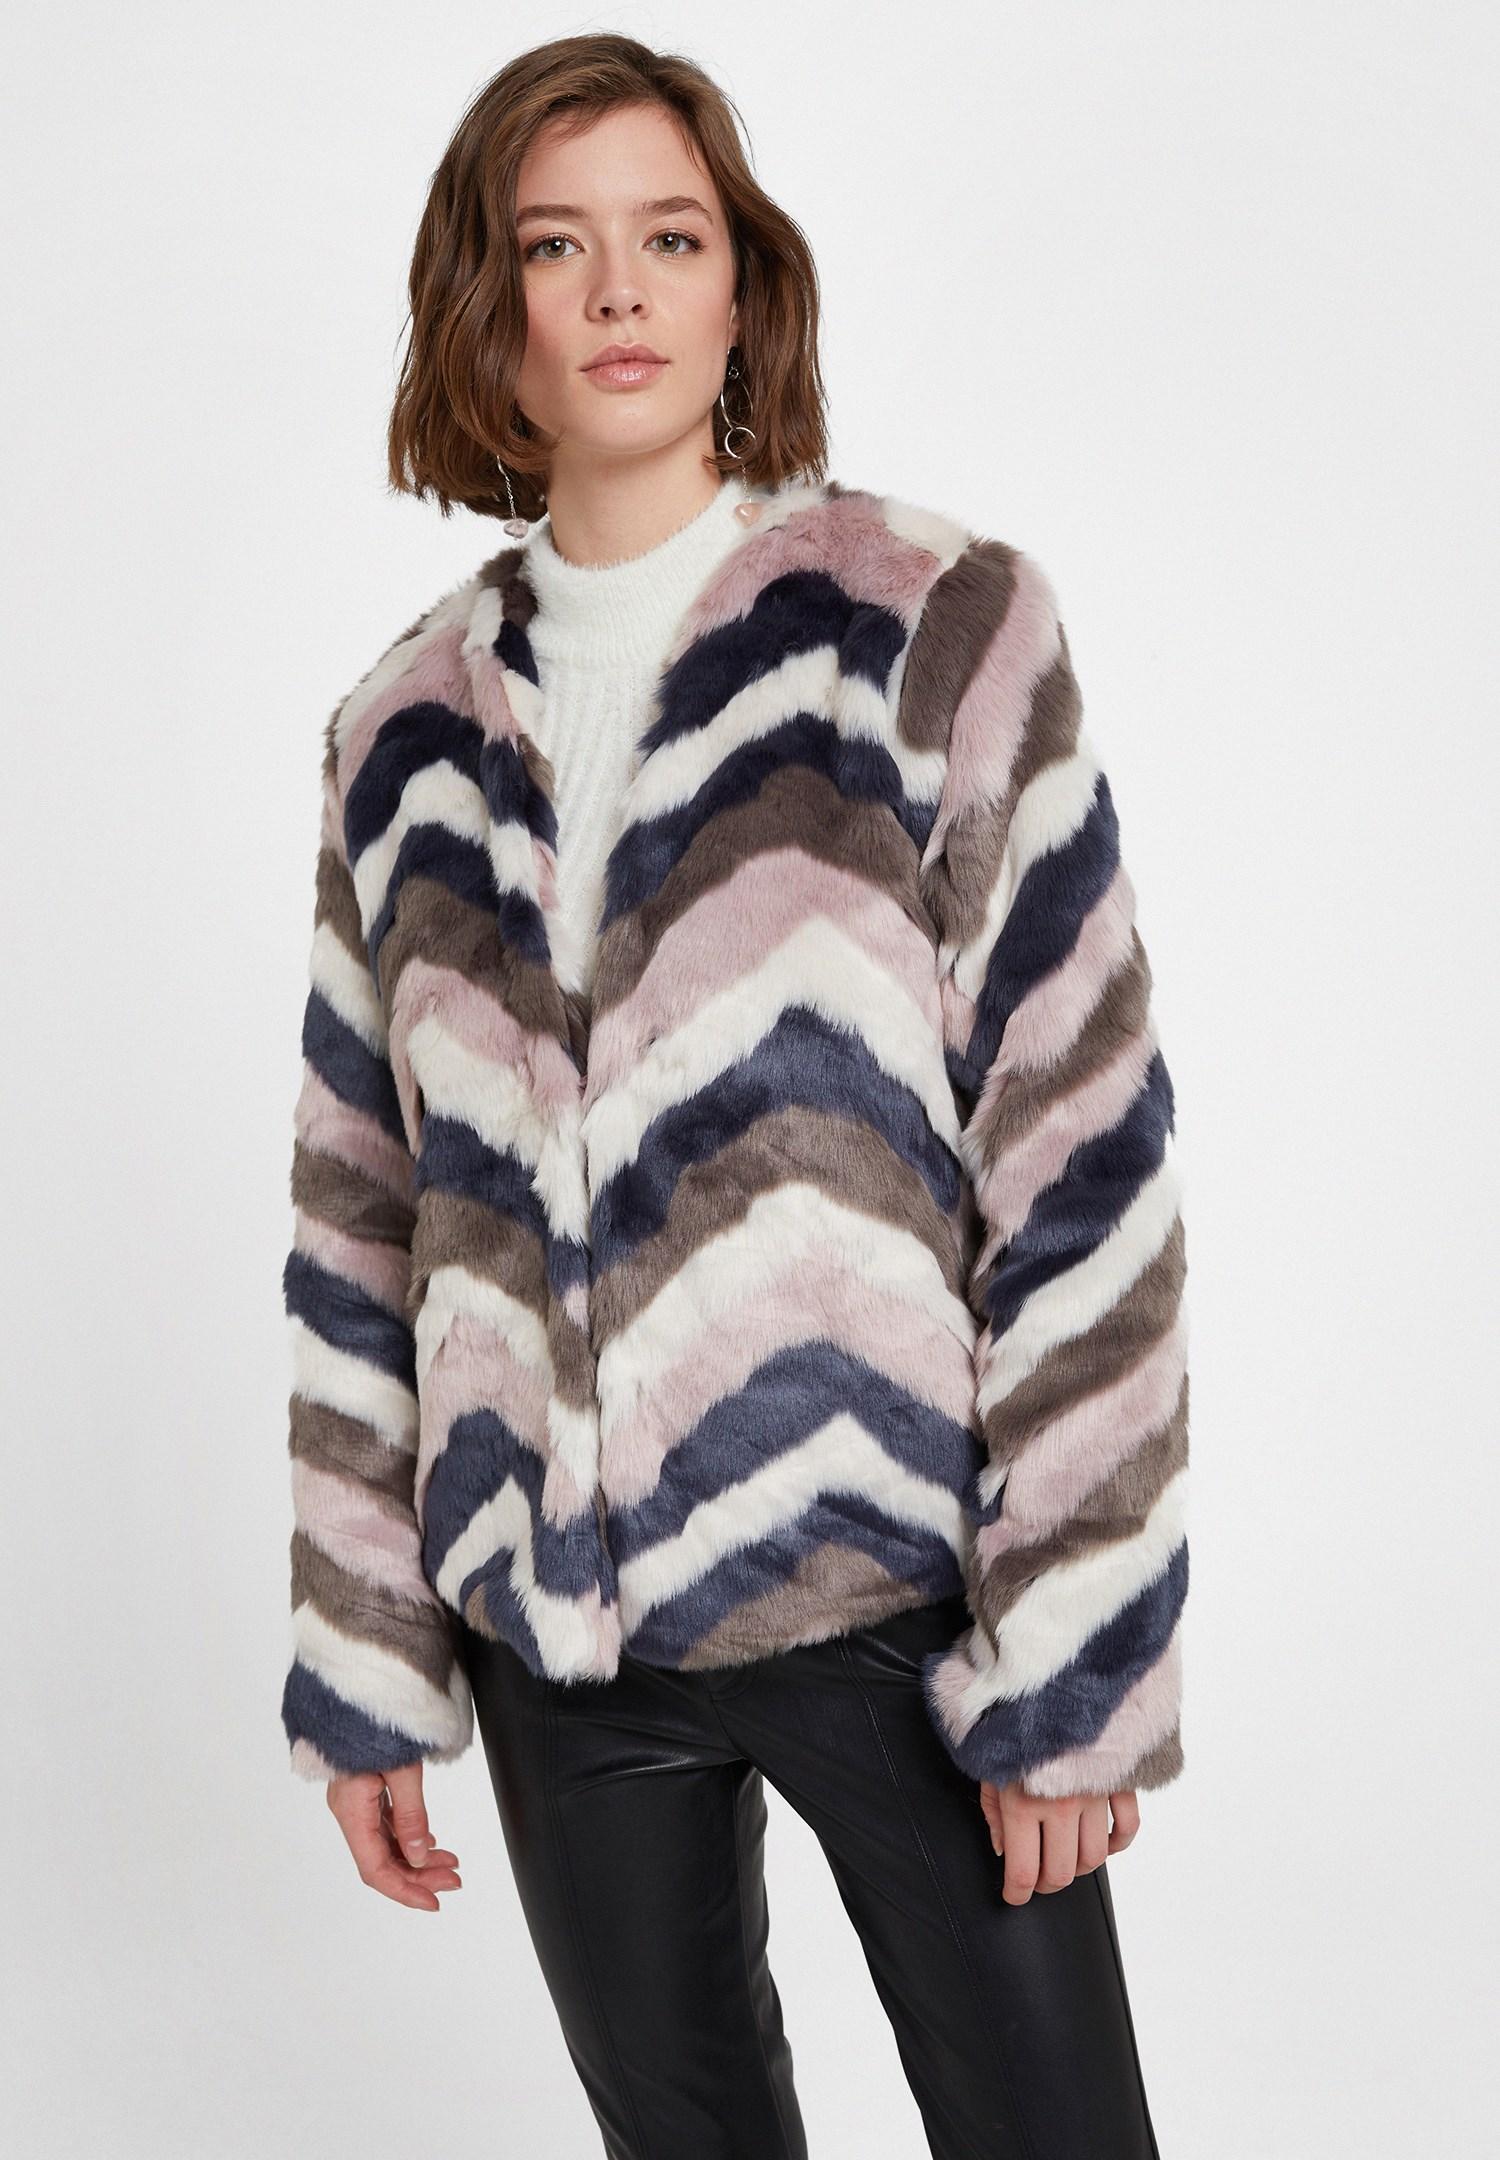 Women Mixed Faux Fur Jacket